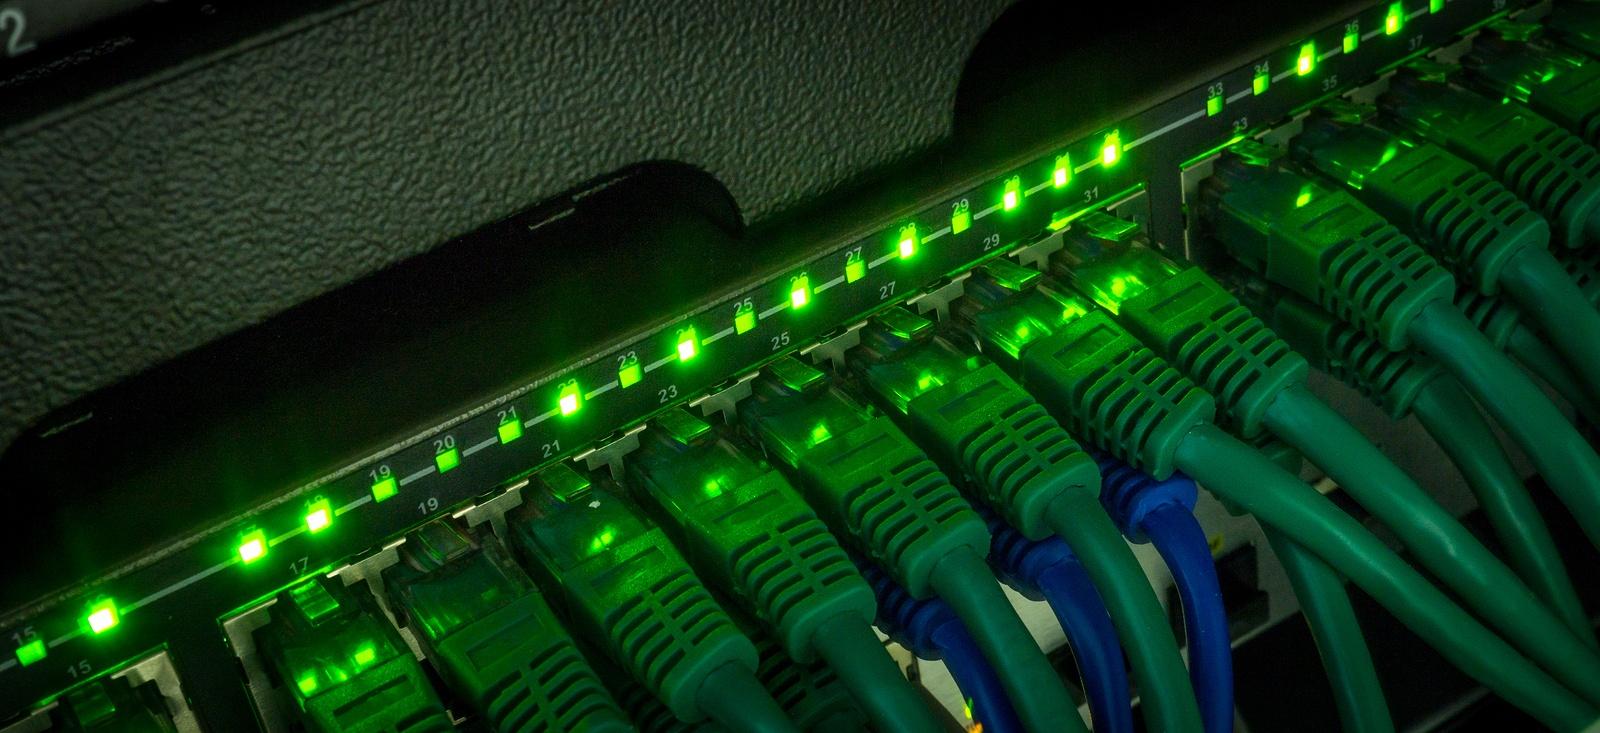 MantisNet-Products-Intelligent-Network-Monitoring.jpg